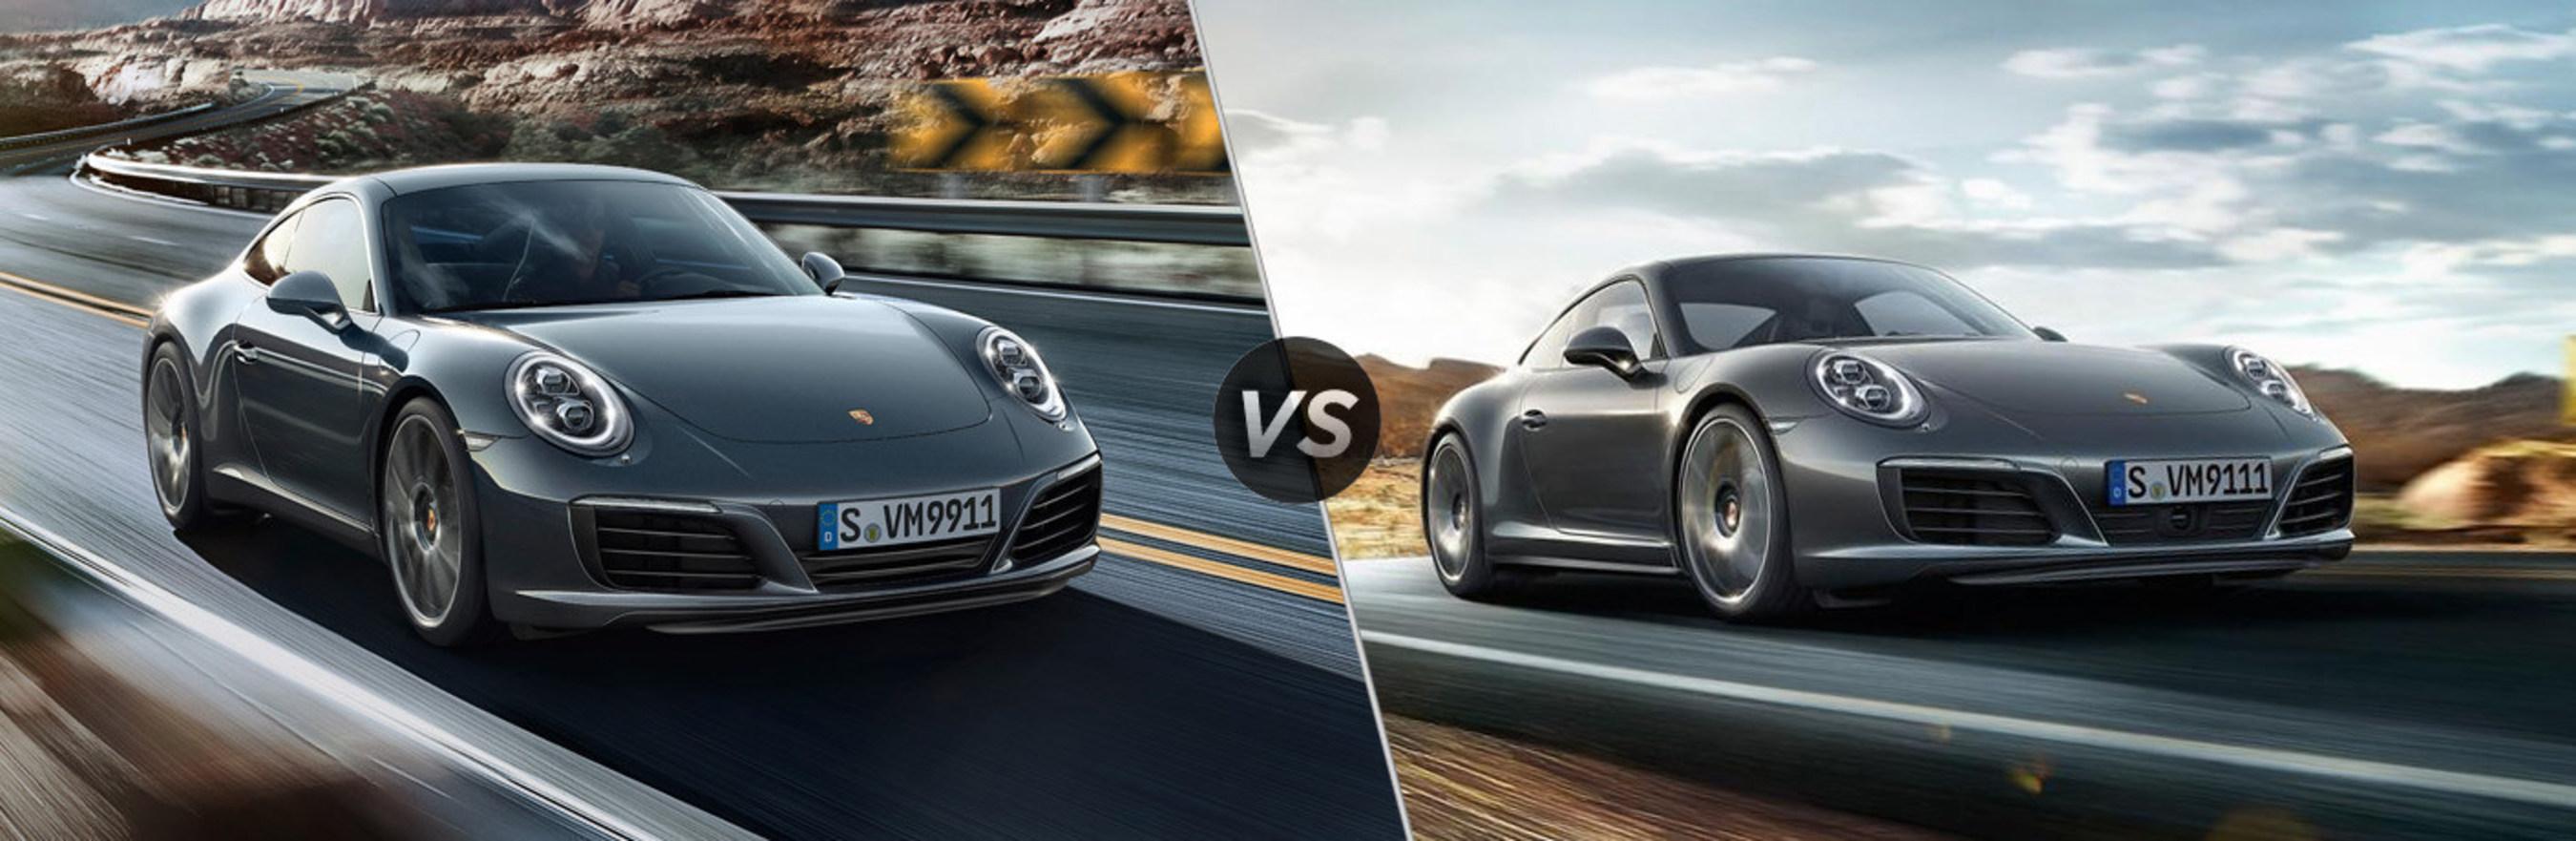 Loeber Motors explains key difference between two popular 2017 Porsche 911 models